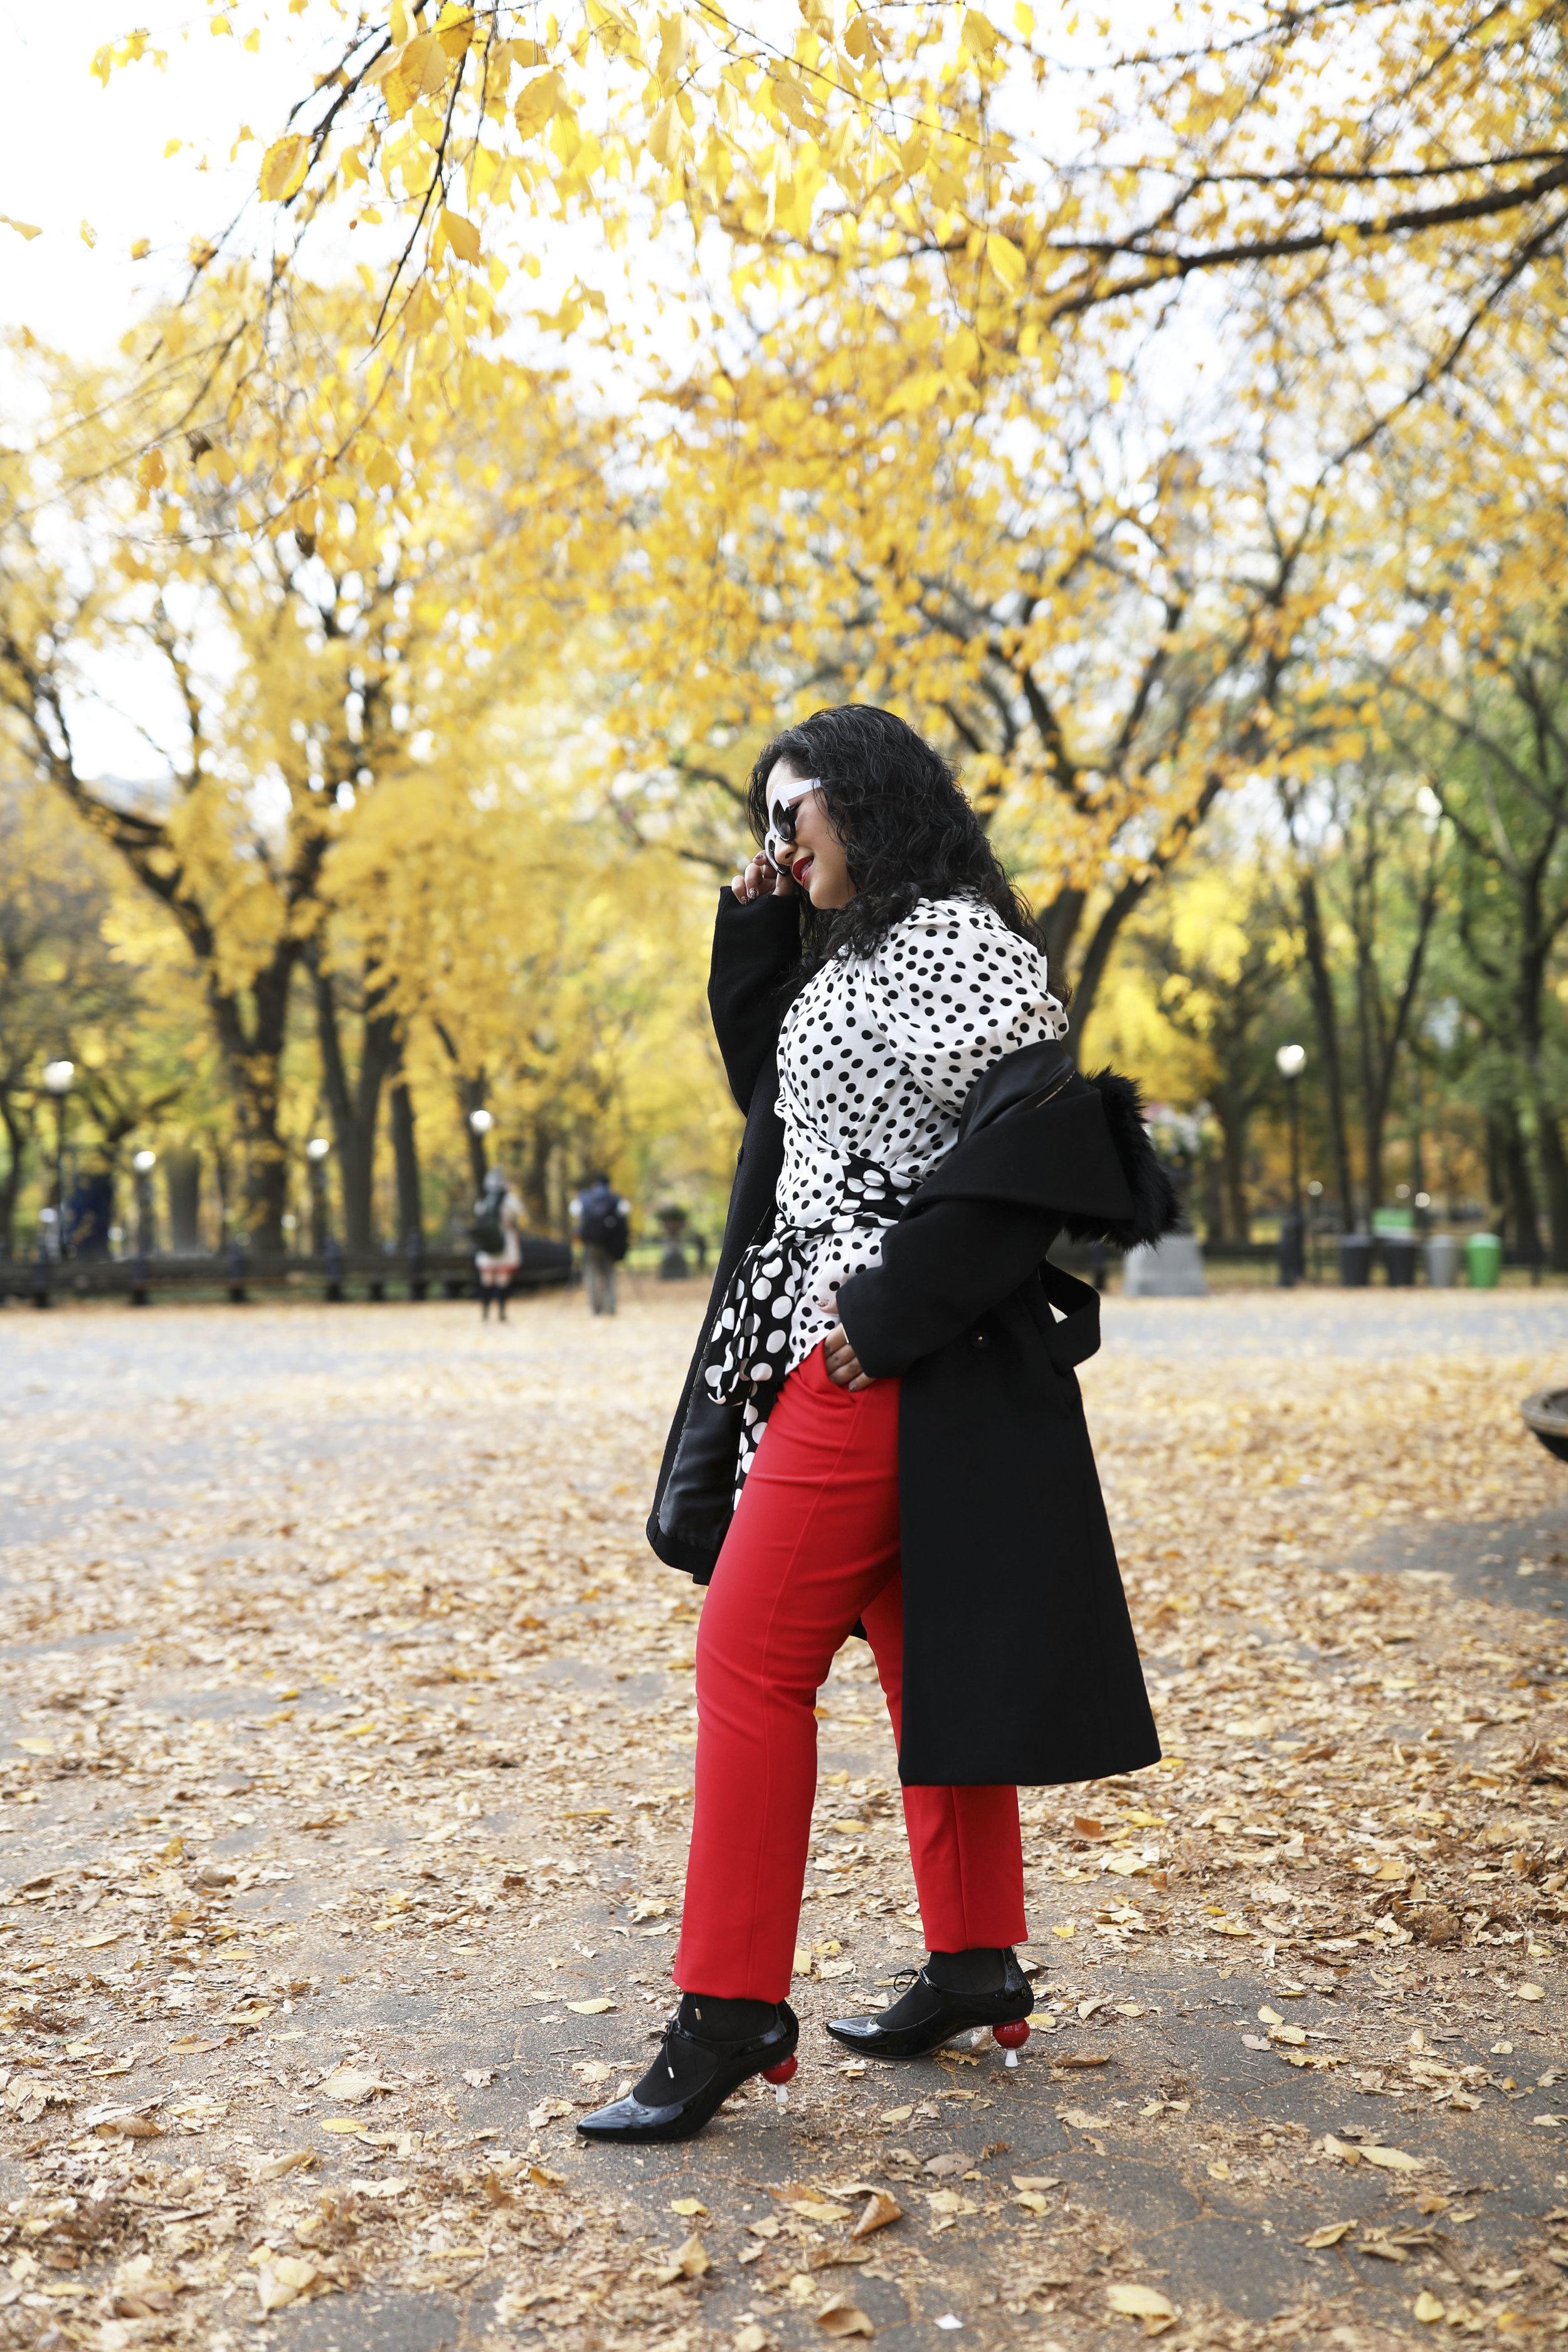 Krity S x Fall Work Outfit x Polka Dot4.jpg